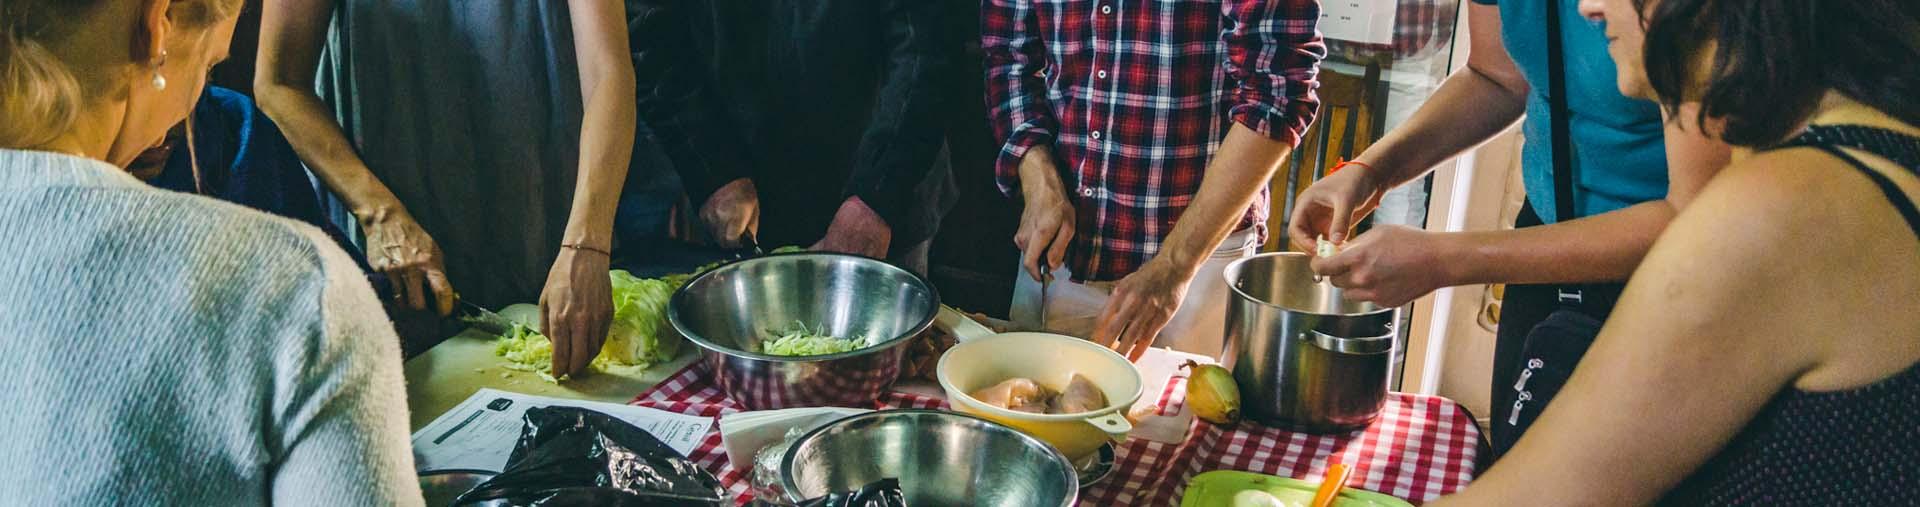 cooking class nazareth